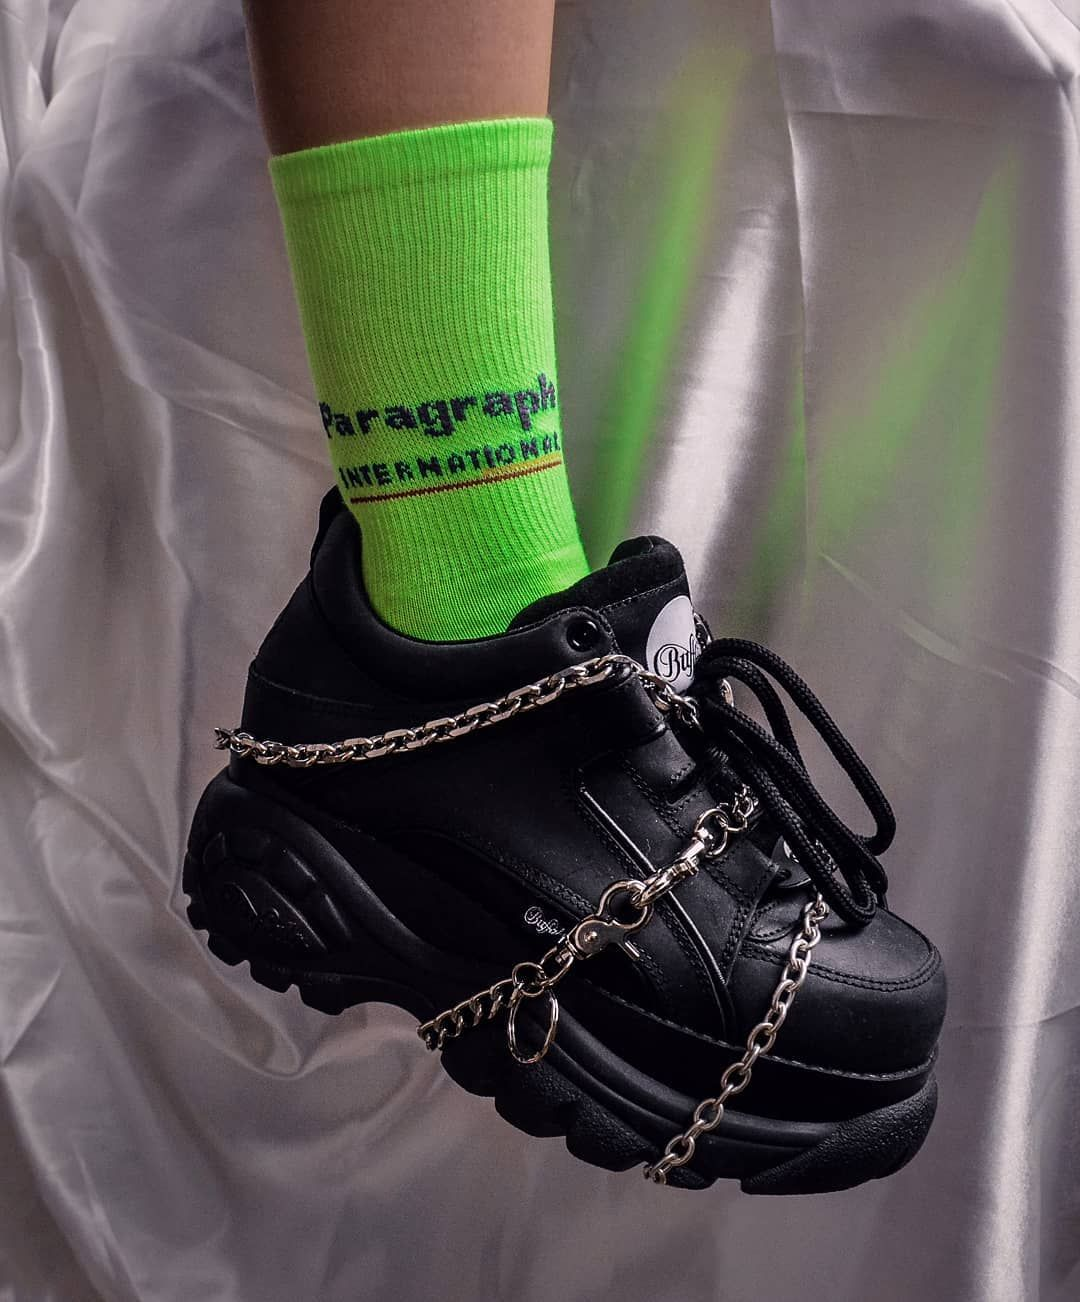 bc607ce949c422 90 s Style Buffalo Schuhe mit Ketten und neon Socken   Buffalo Classic  Boots    buffaloclassics  schuhe  90sfashion  90sstyle  buffaloshoes   neongreen